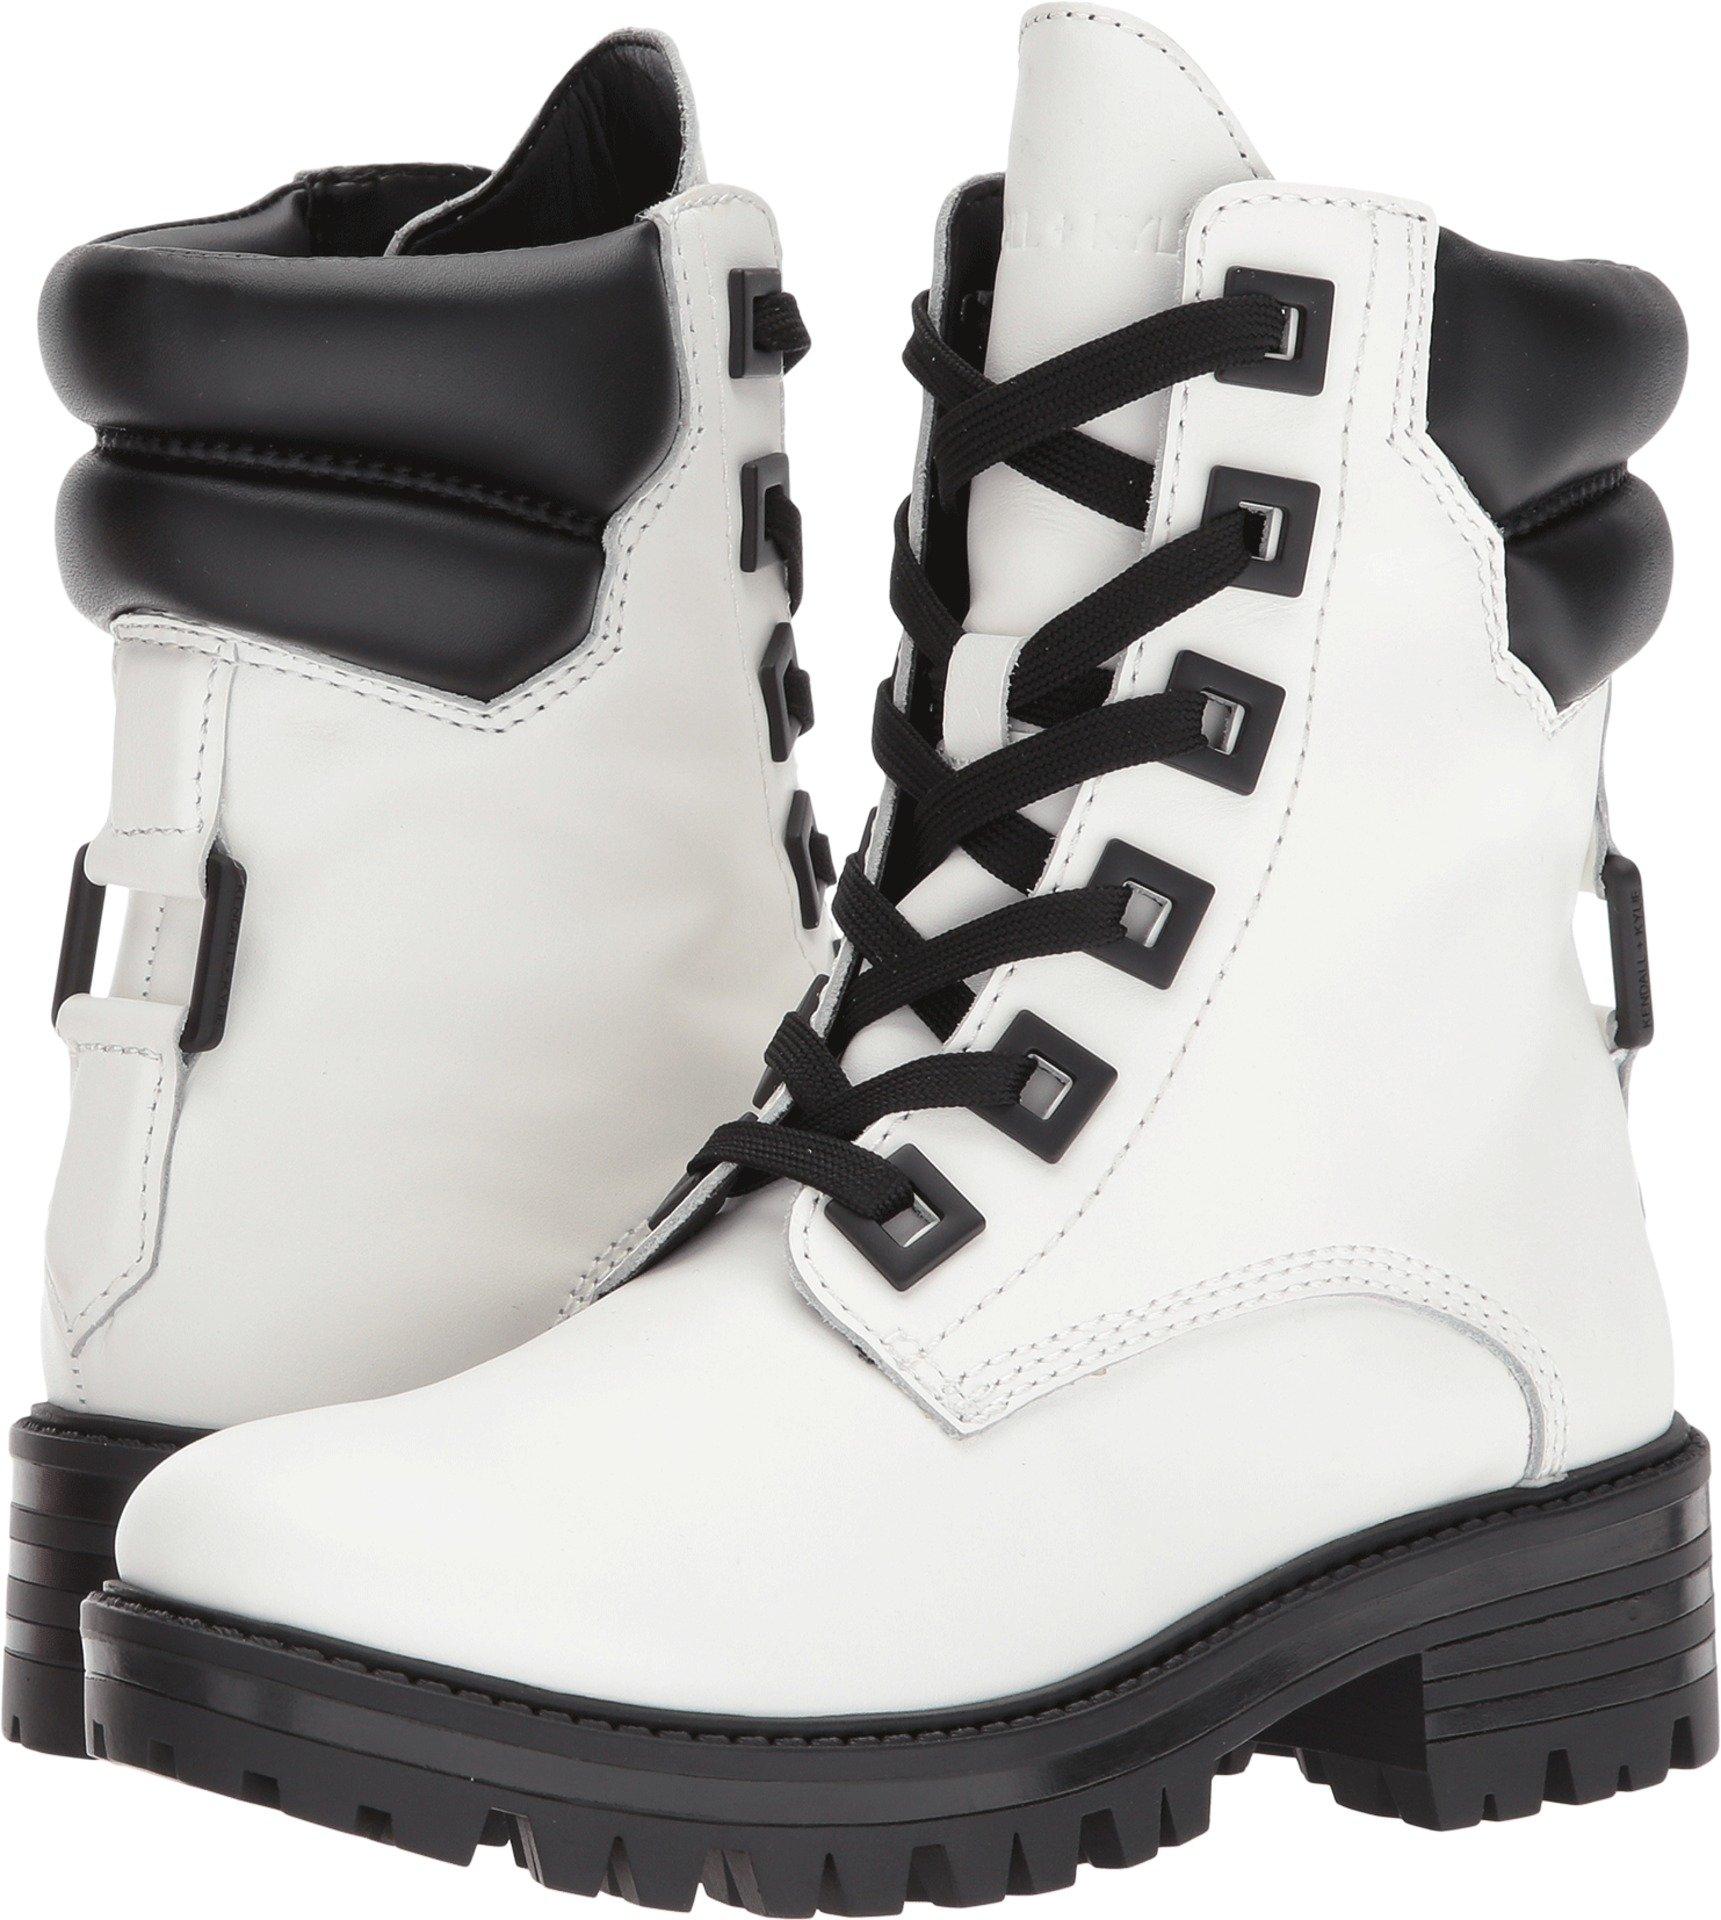 KENDALL + KYLIE Women's East Combat Boot, White, 8.5 Medium US